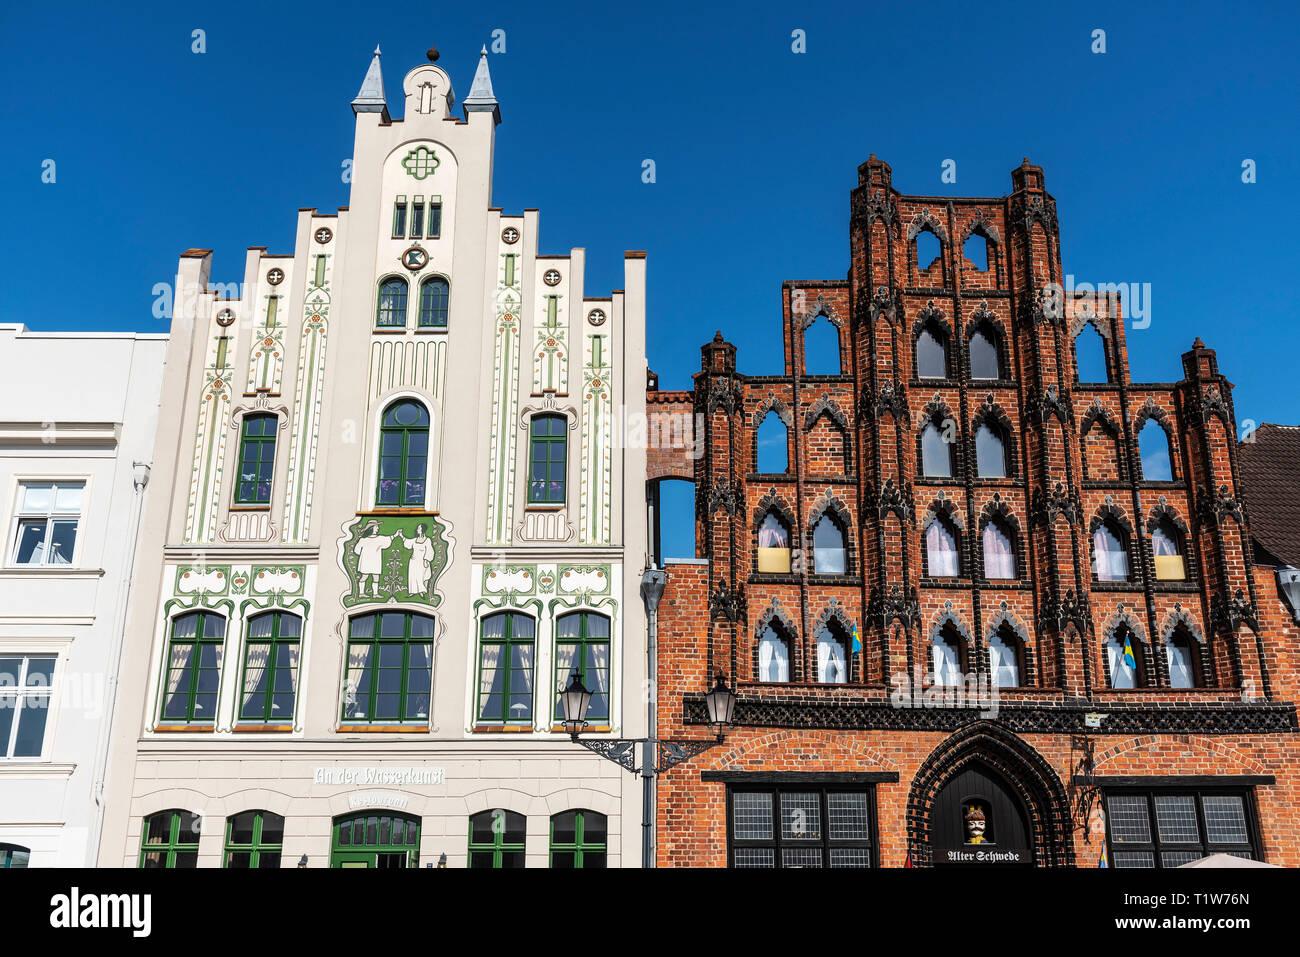 historic gabled houses, market place, Wismar, Mecklenburg-Western Pomerania, Germany - Stock Image